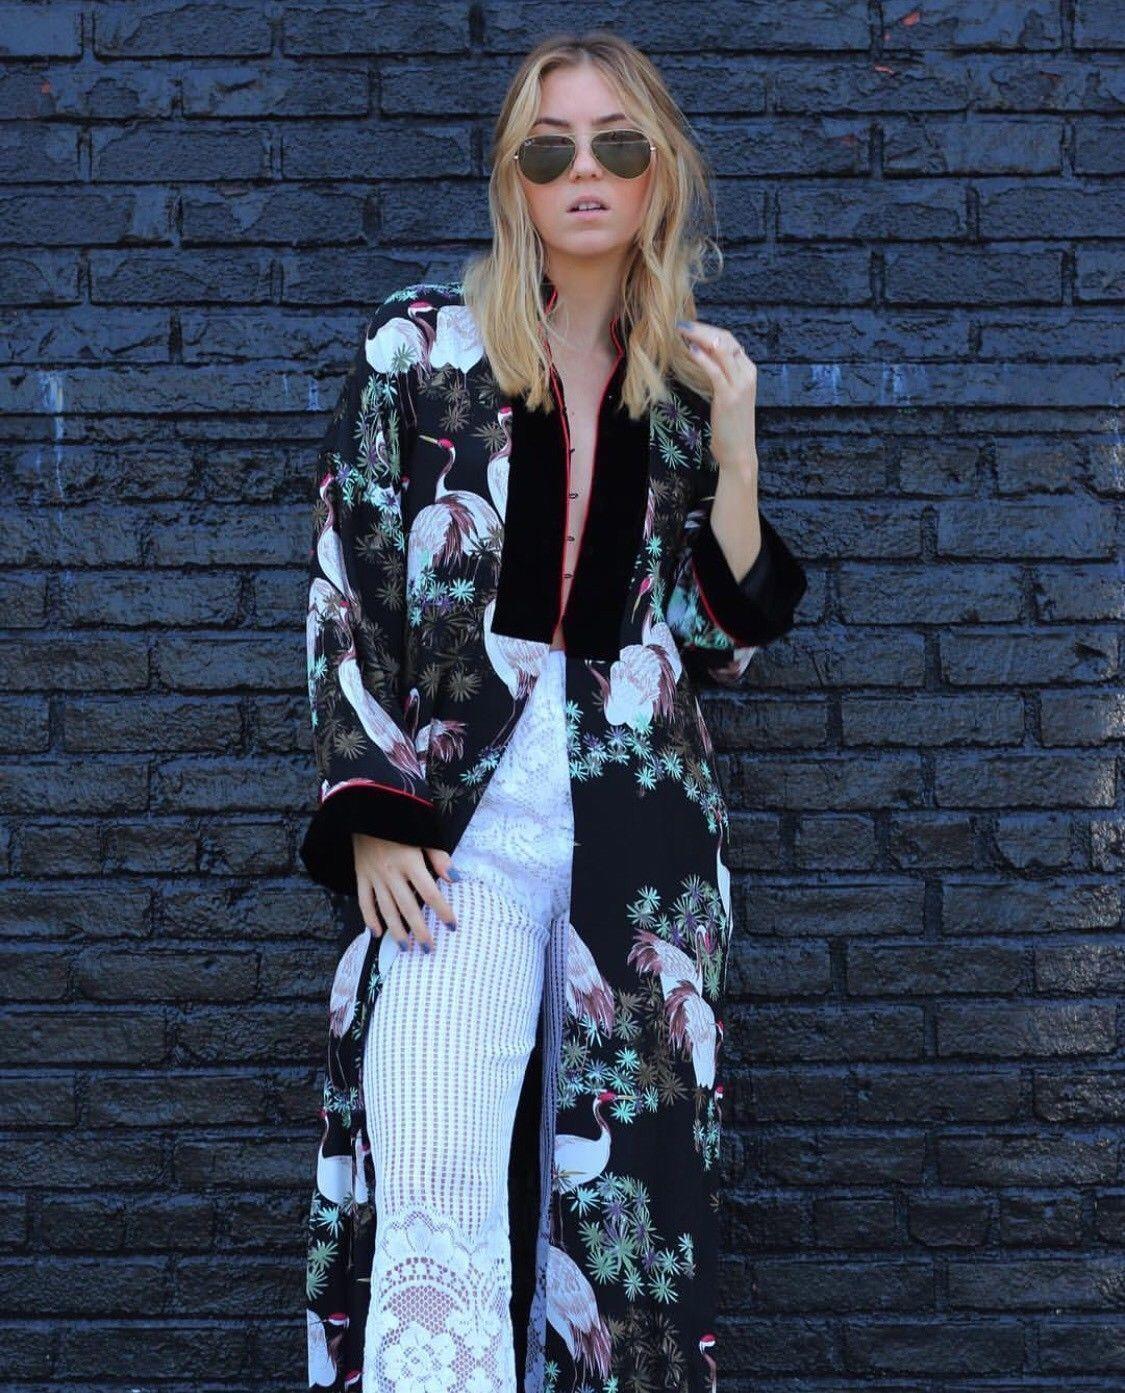 Nwt Zara AW17 Blaumen Vogel Druck samt Kimono Mantel Kleid 2731 243 _ Xs S M